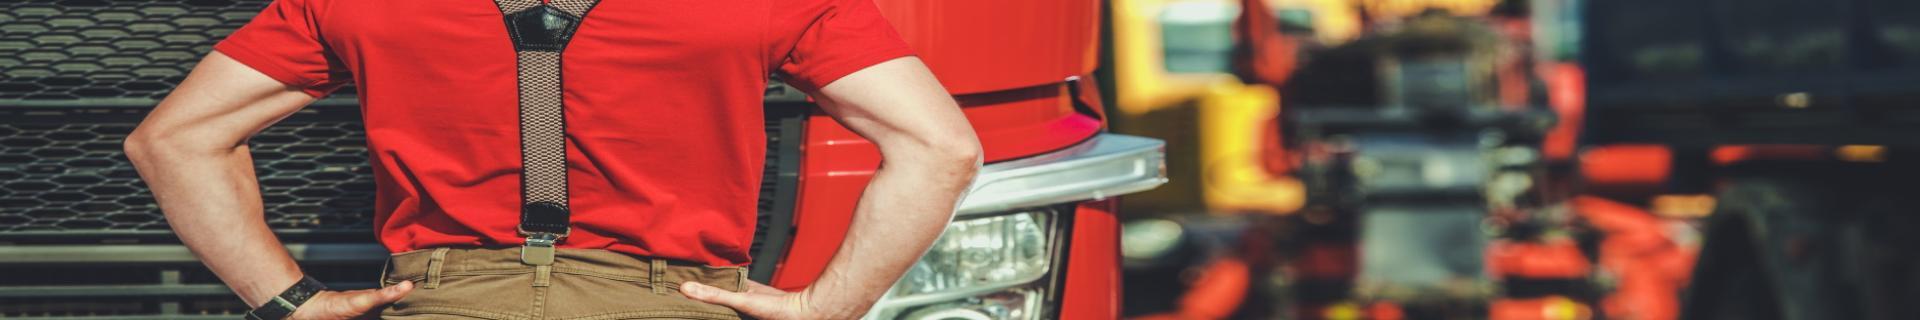 Entry-Level Driver Training: Hazard Perception